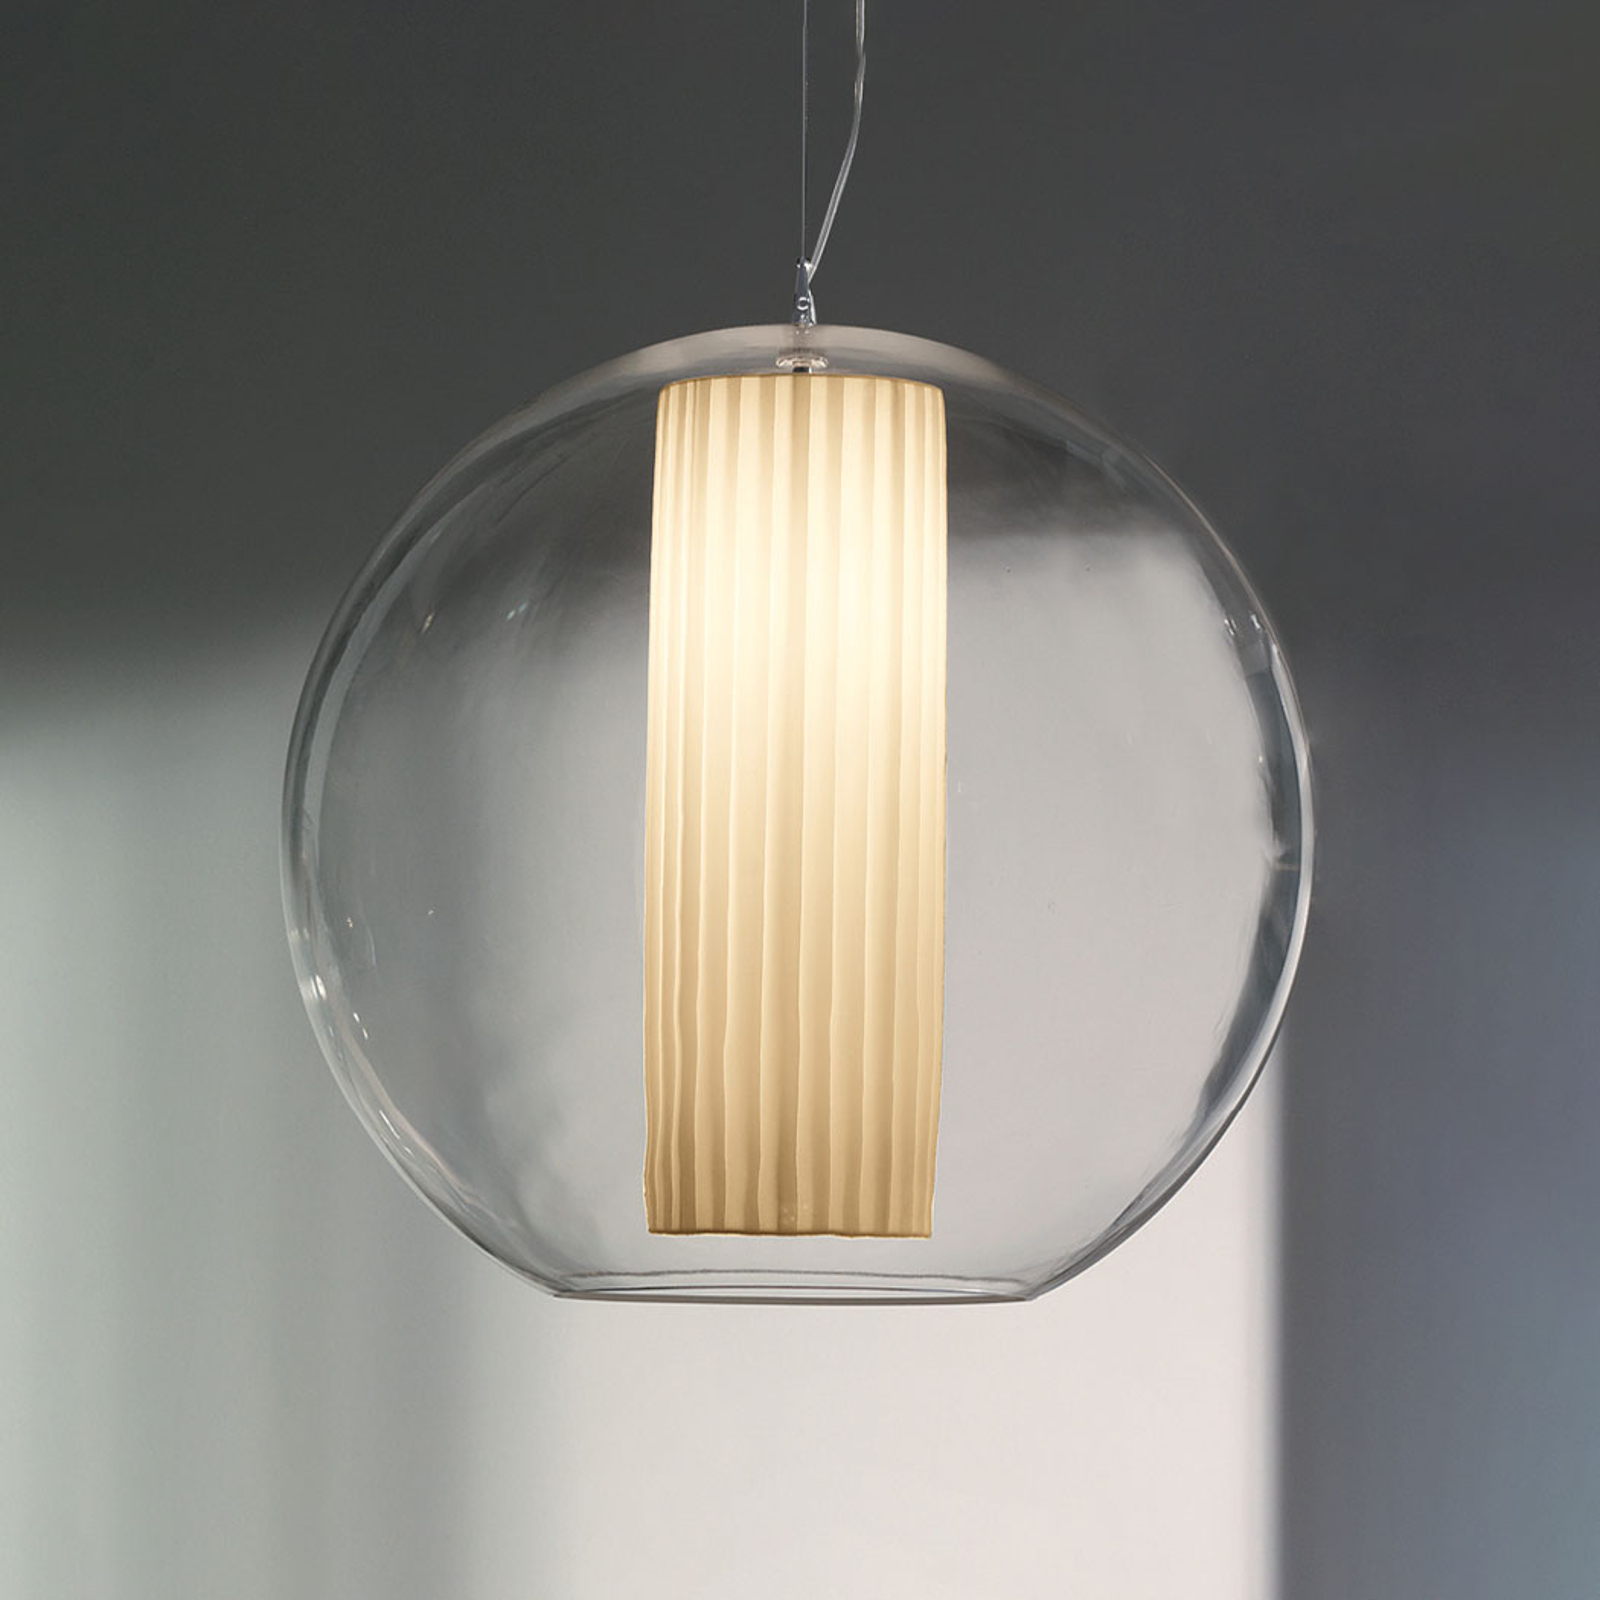 Modo Luce Bolla hanglamp stof wit Ø 50cm